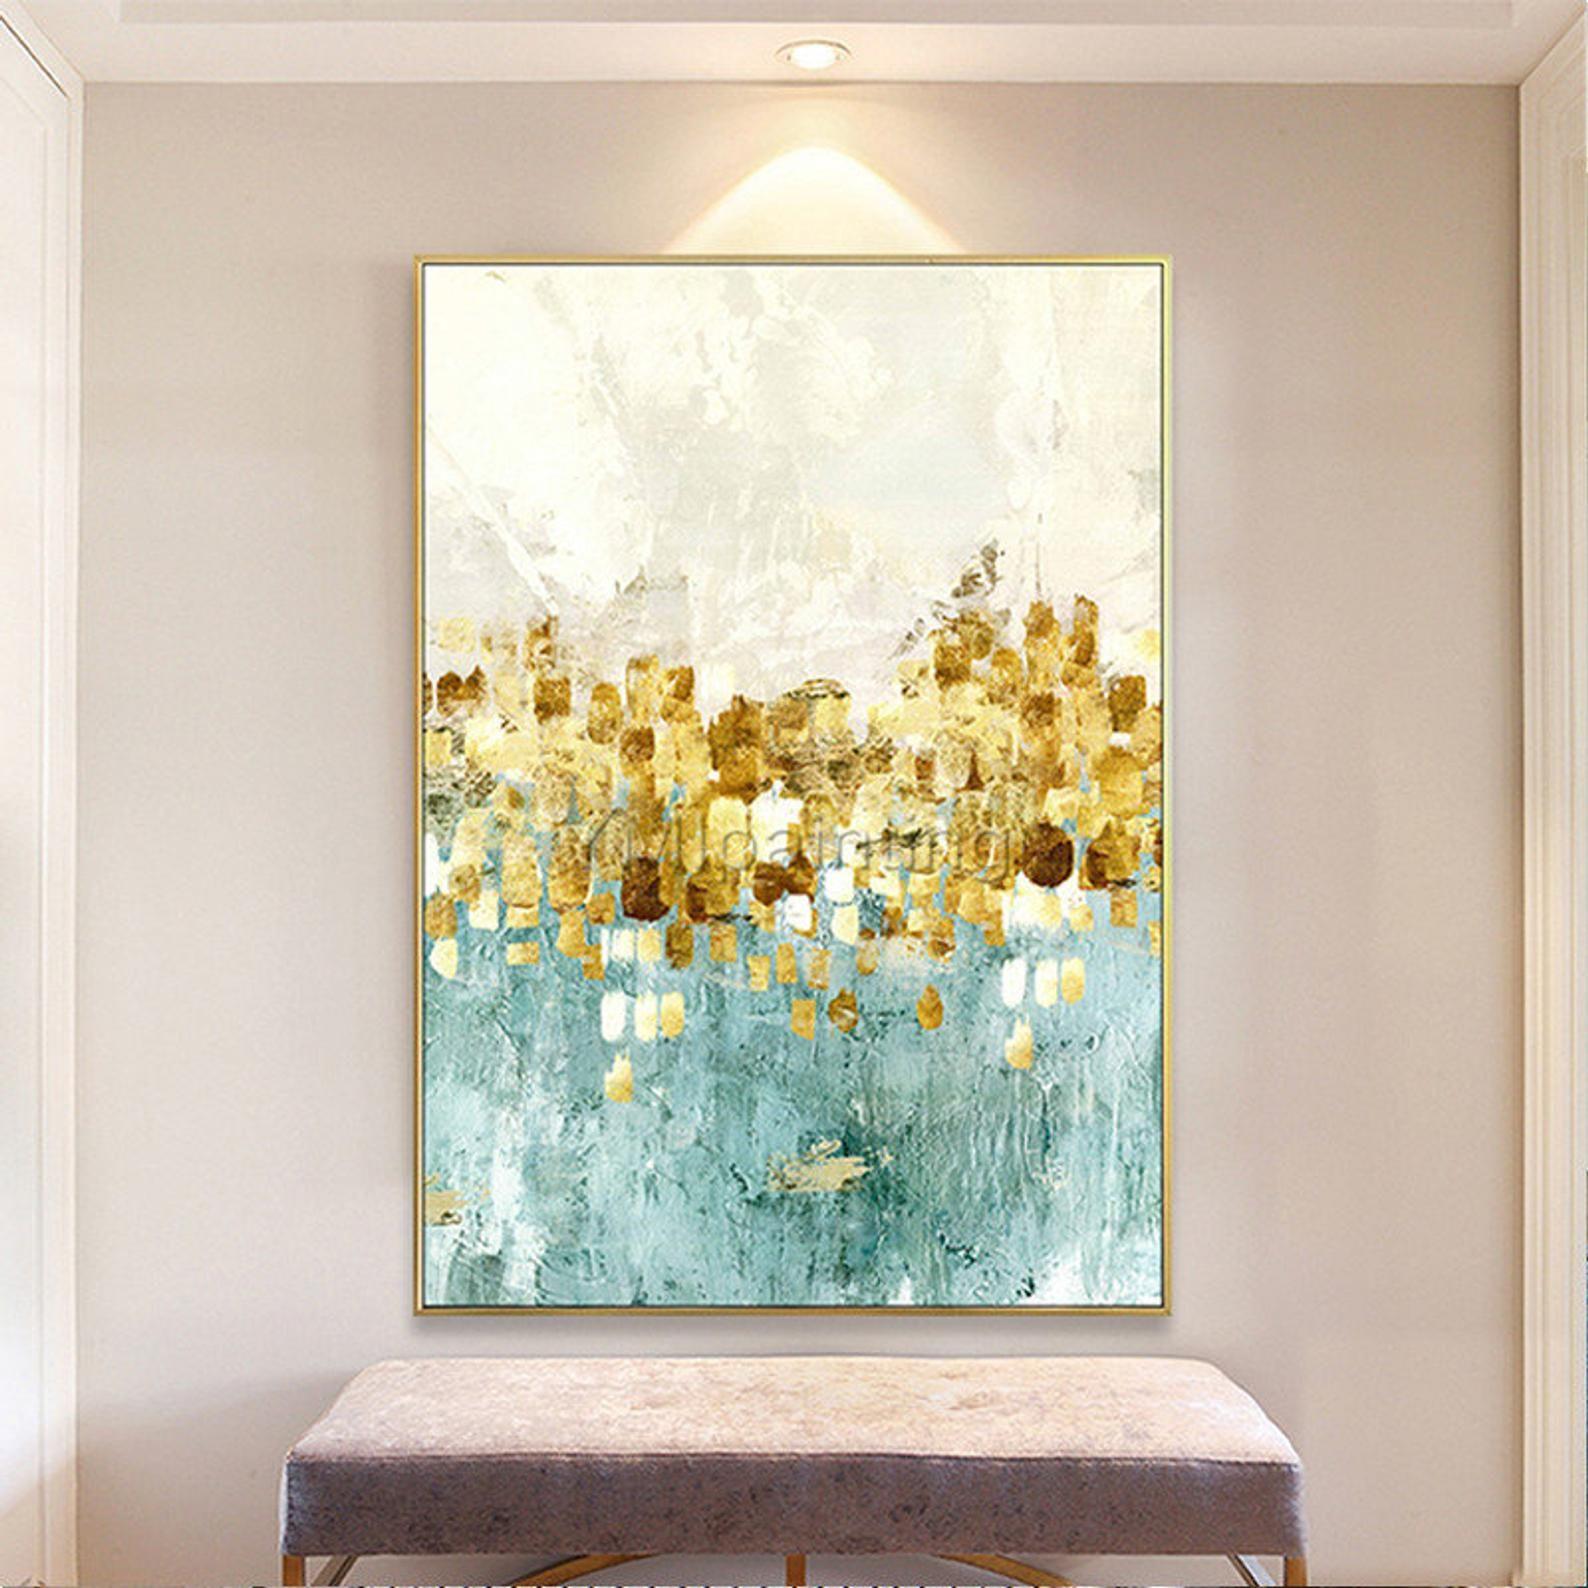 Gold Art Acrylic Paintings On Canvas Art Modern Abstract Etsy Modern Art Abstract Abstract Painting Acrylic Painting Canvas